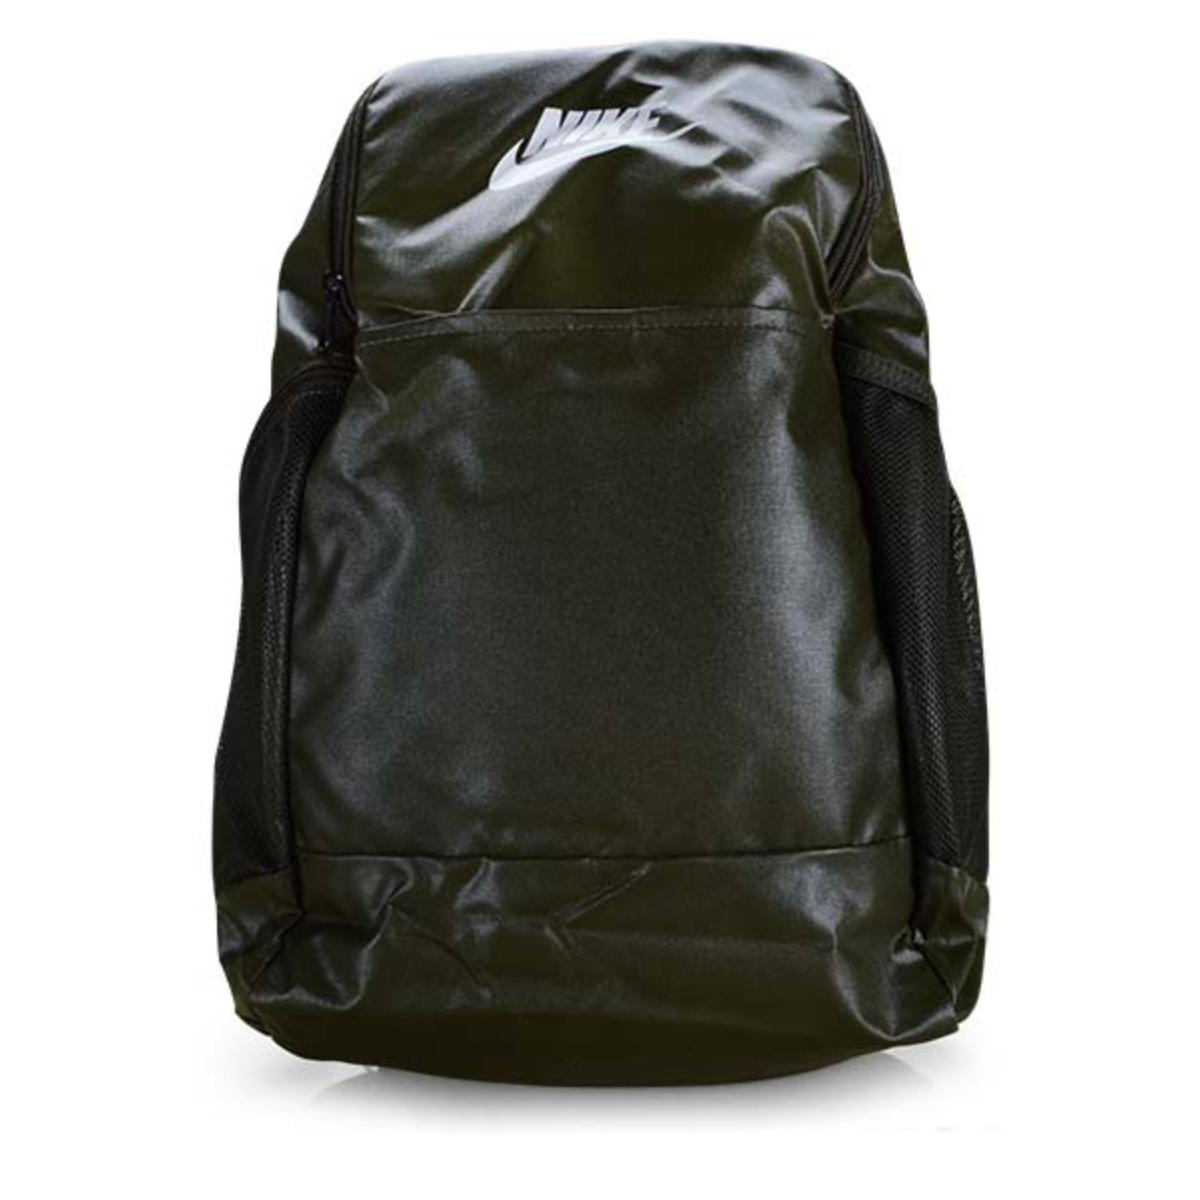 Mochila Unisex Nike Ba6124-325  Brsla m Bkpk Musgo/branco